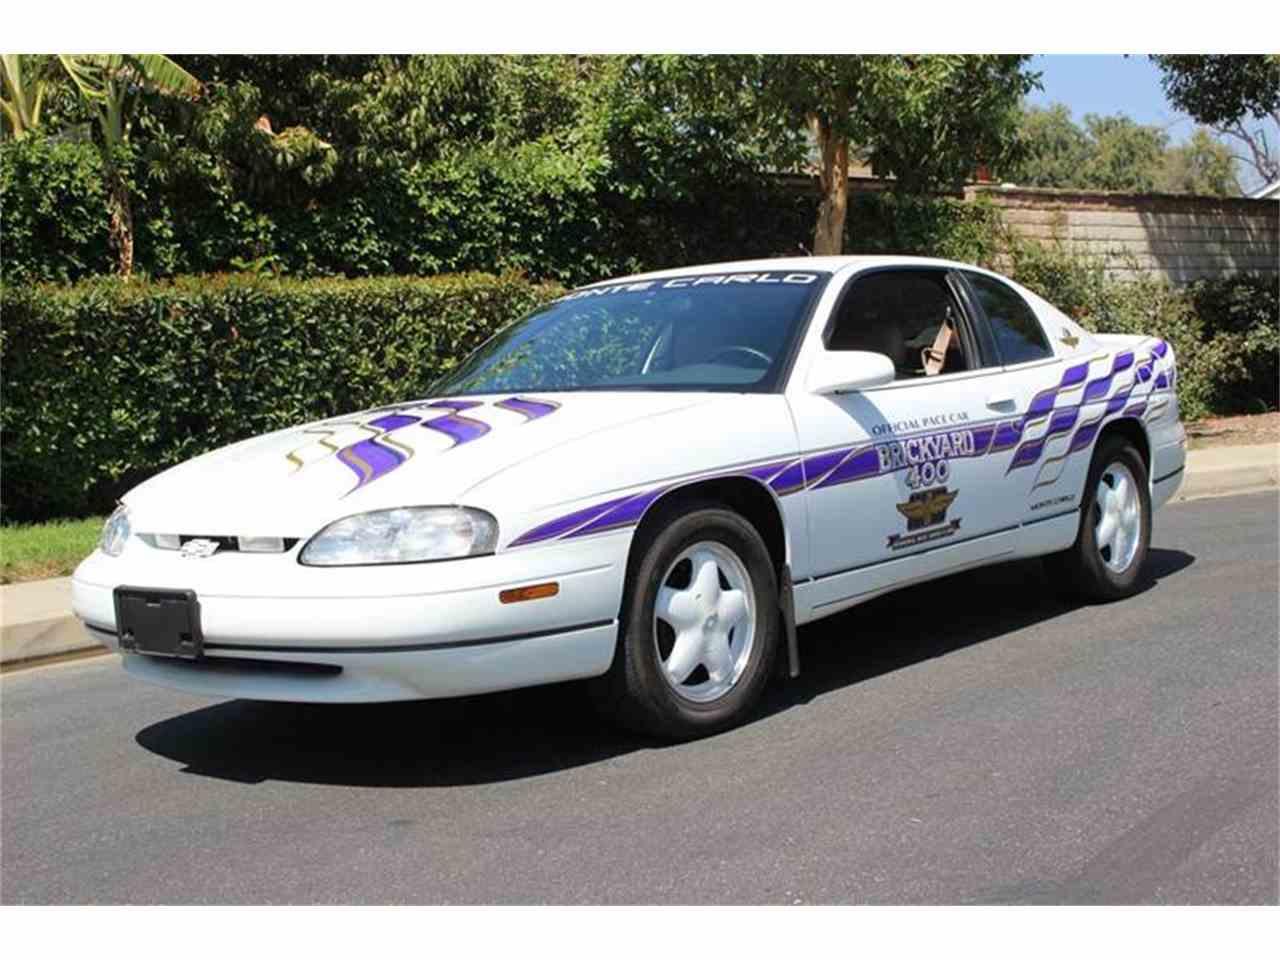 All Chevy 1995 chevrolet monte carlo : 1995 Chevrolet Monte Carlo for Sale | ClassicCars.com | CC-898212